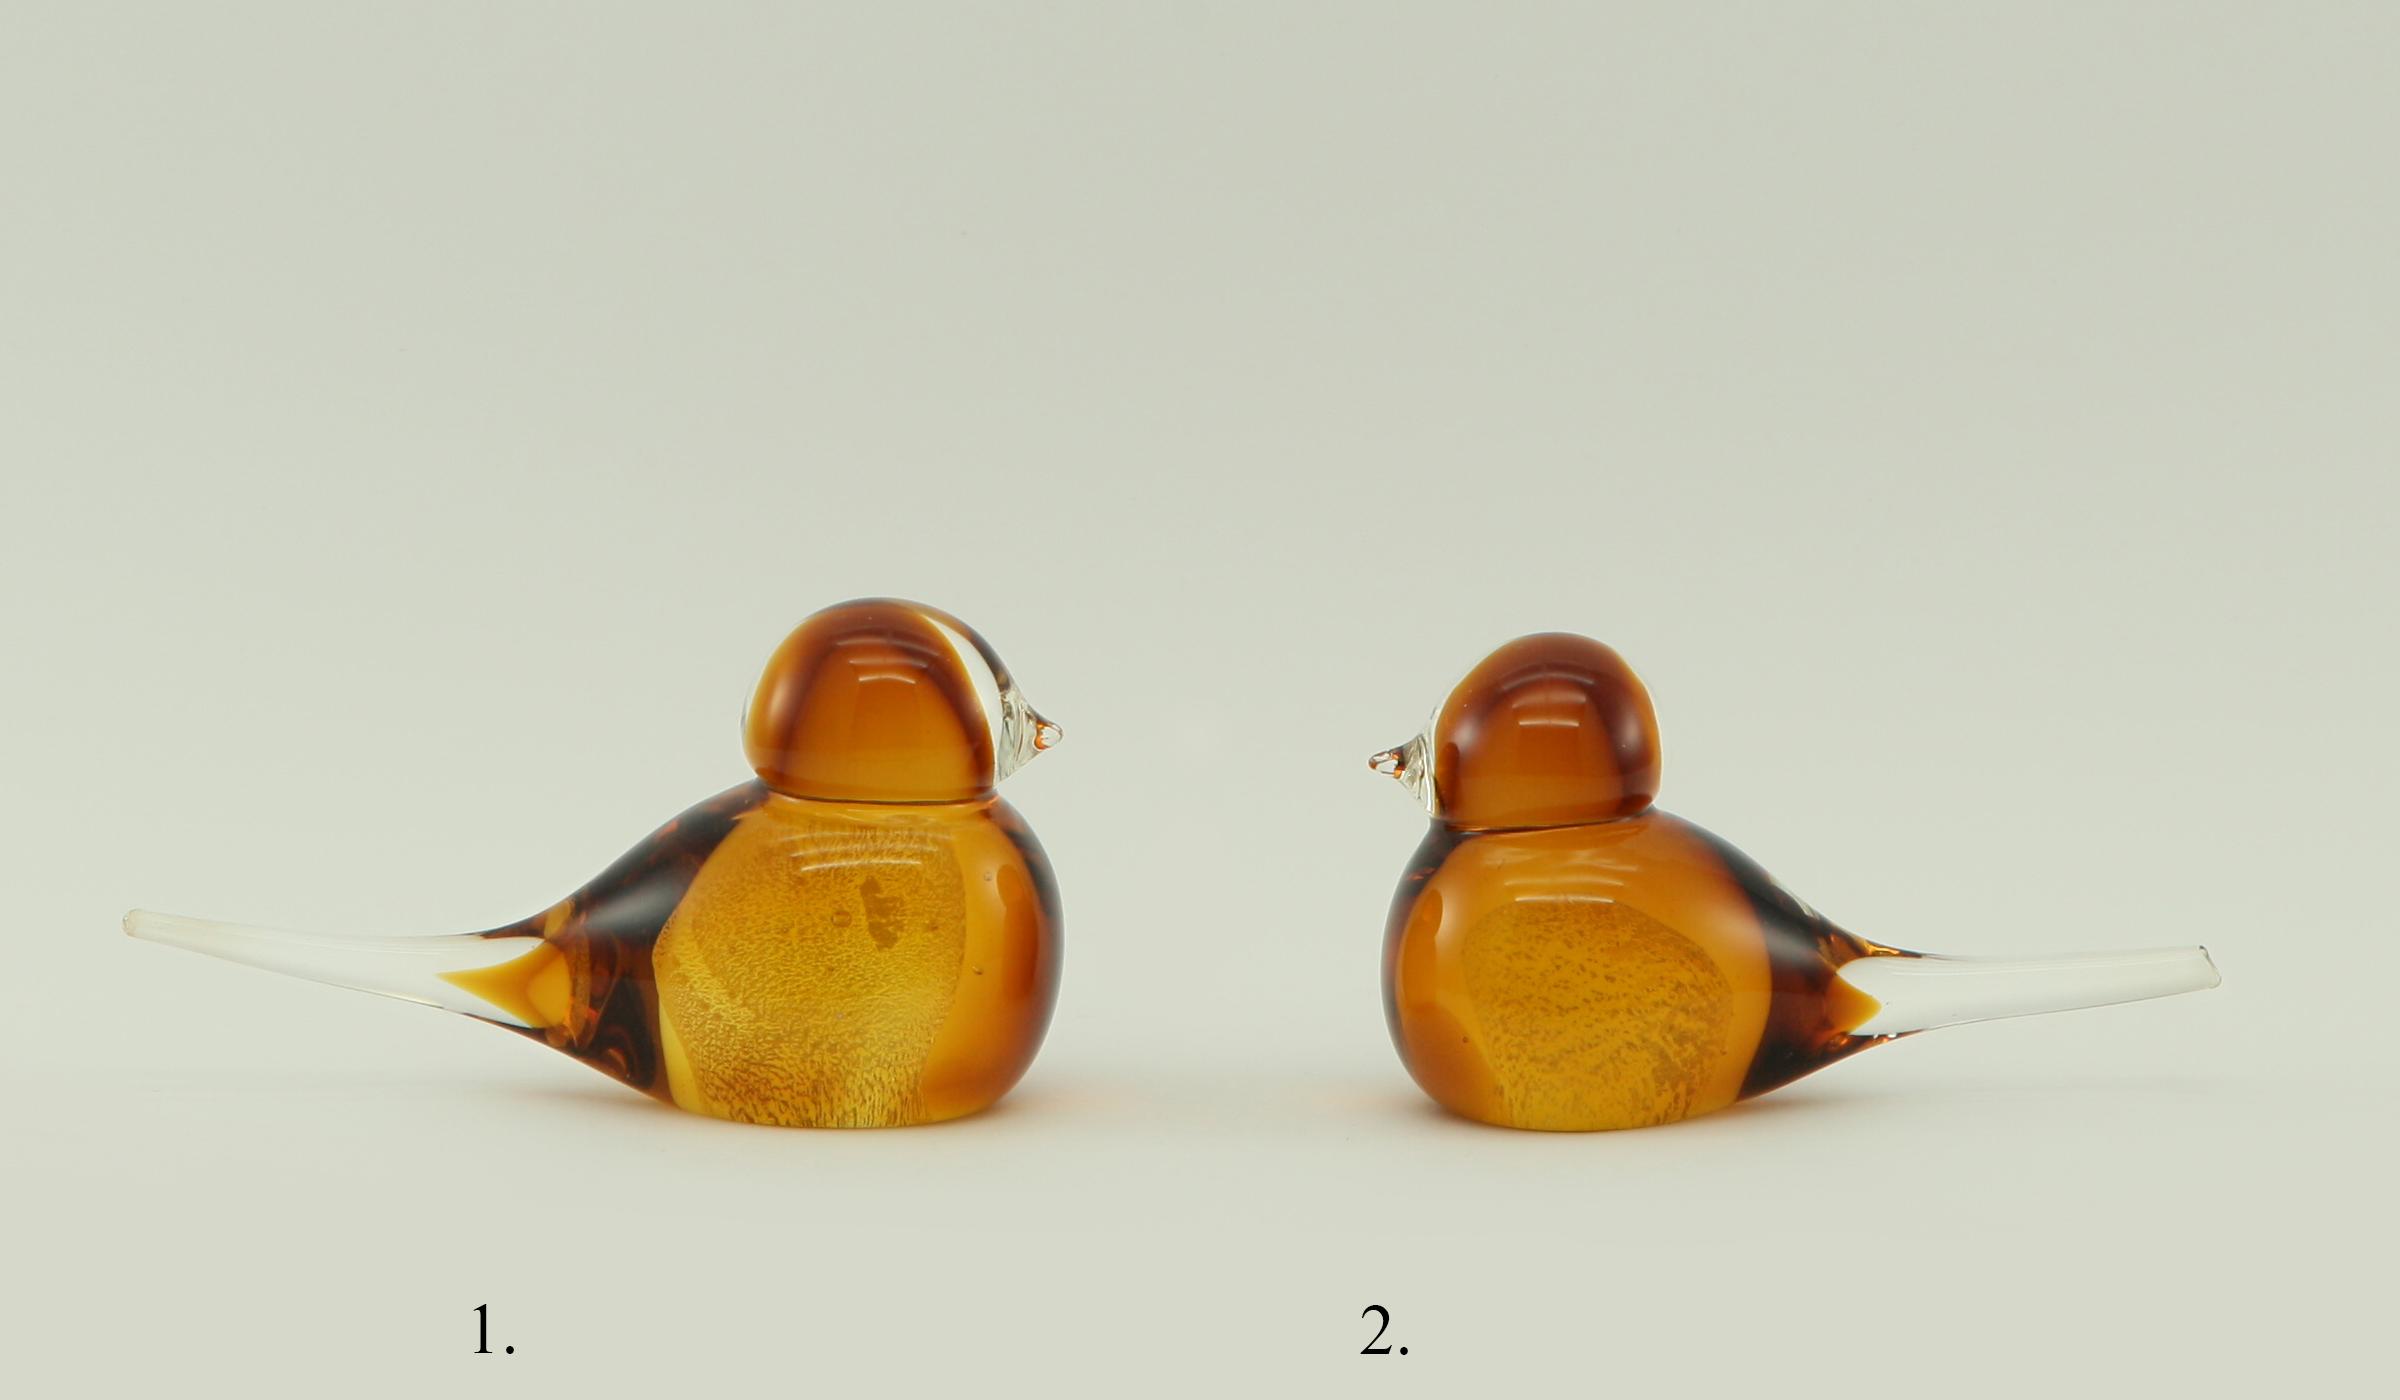 Птички 365(1)/365(2)